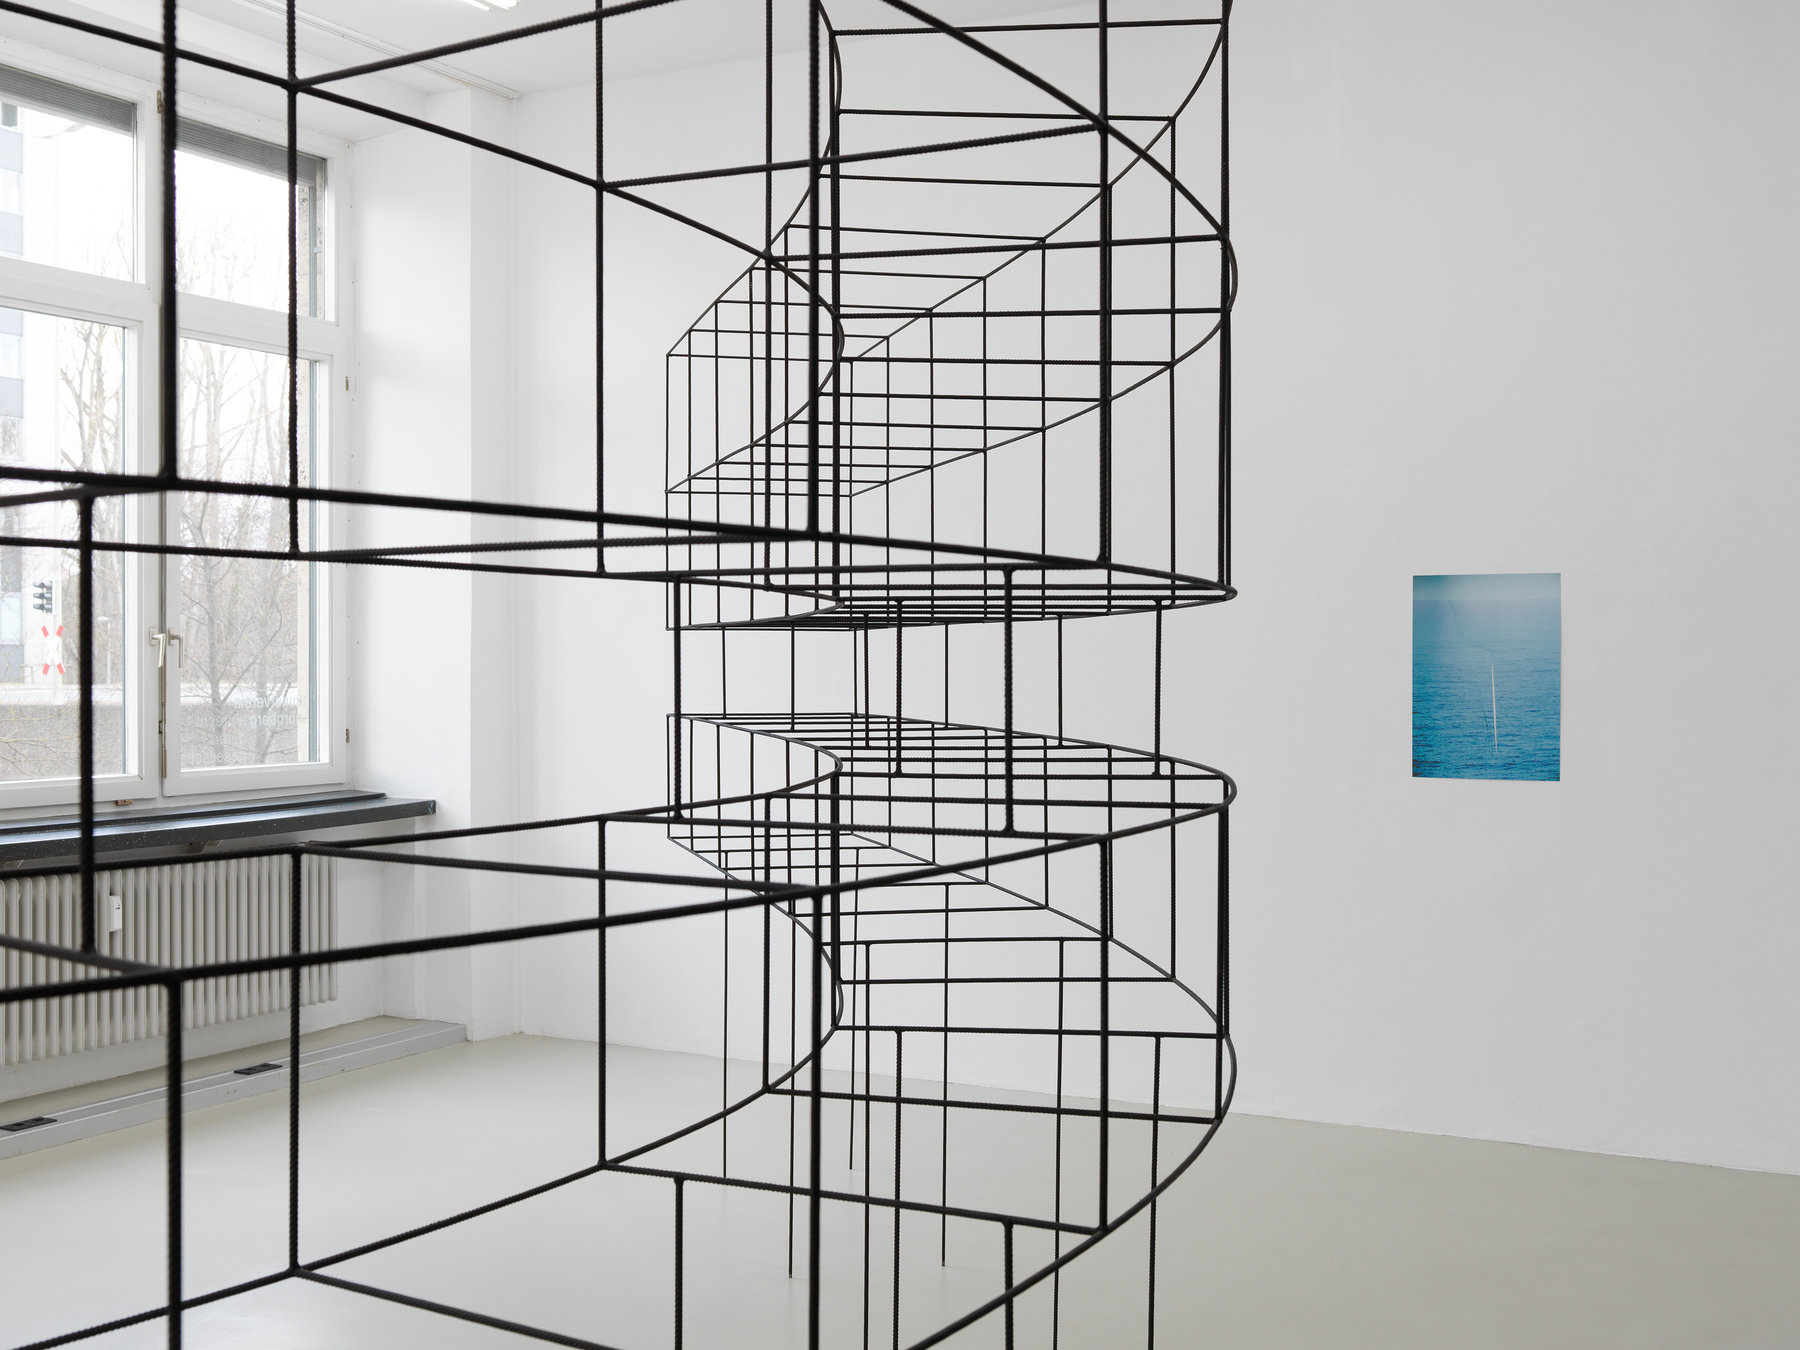 05_Edit Oderbolz_Kunstverein Nürnberg_2017